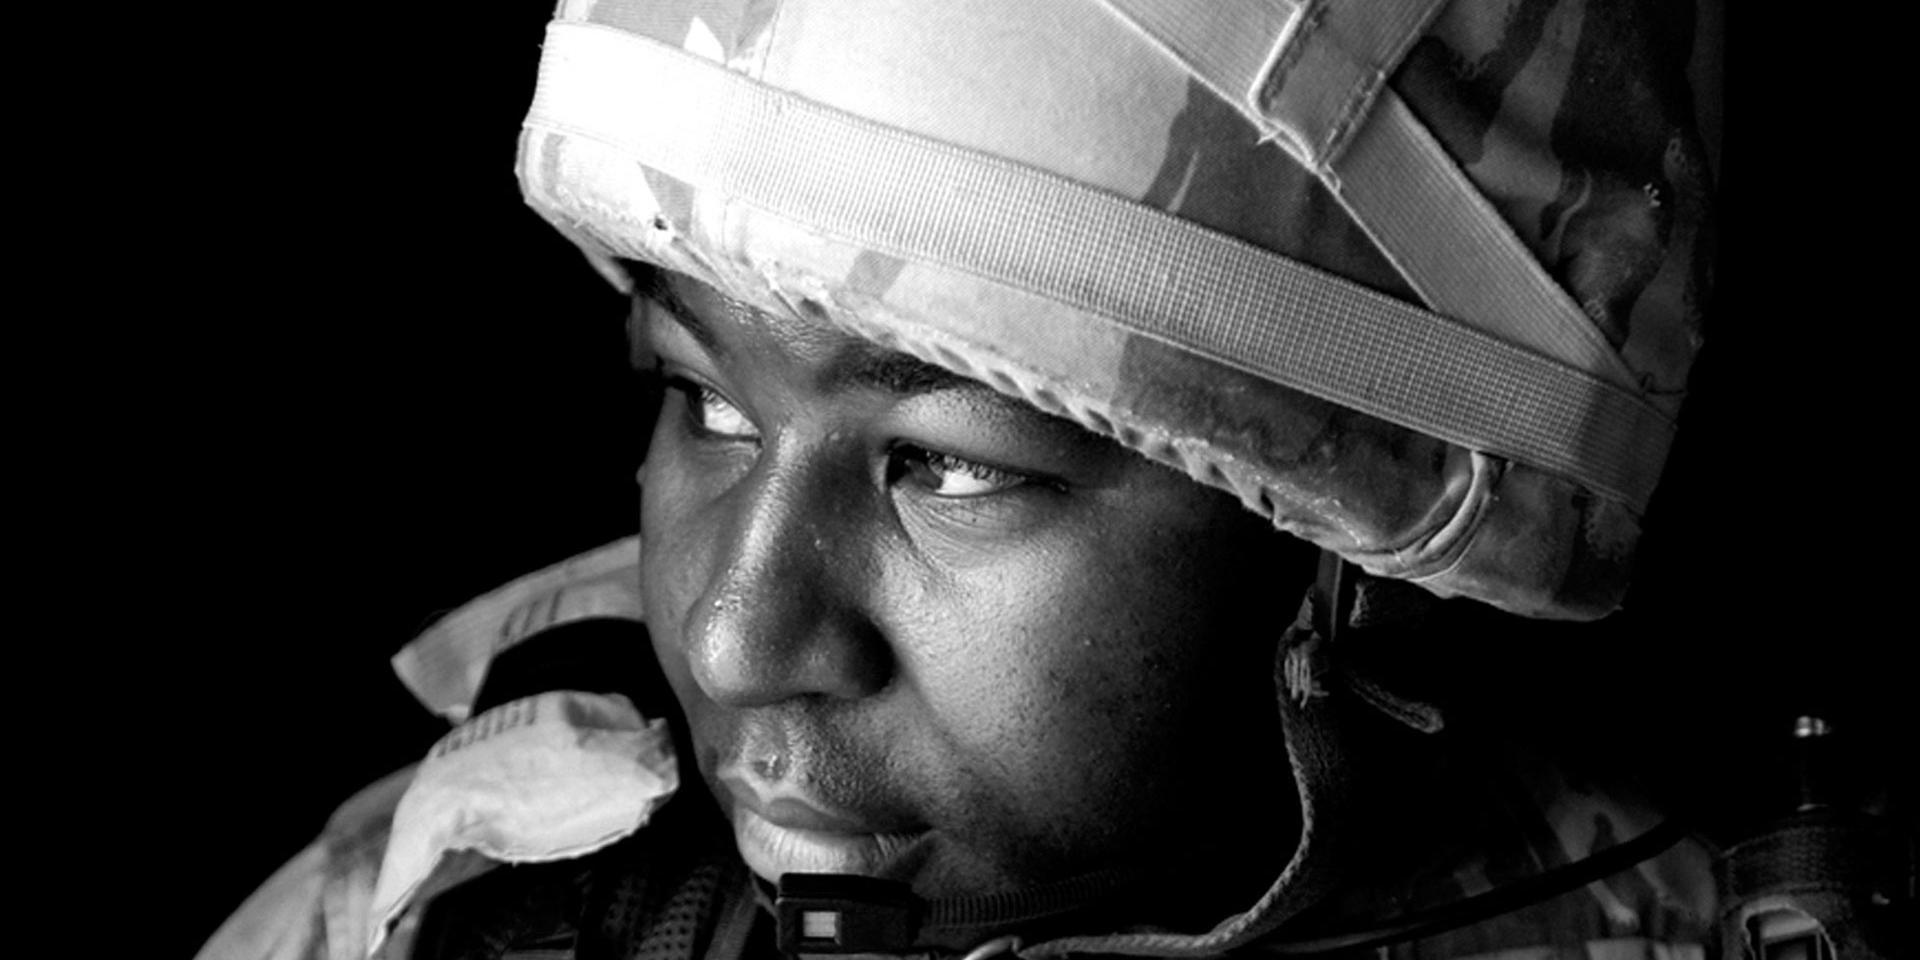 Reservist Sergeant Major Larry Davis serving as Community Liaison Officer in Iraq, 2004